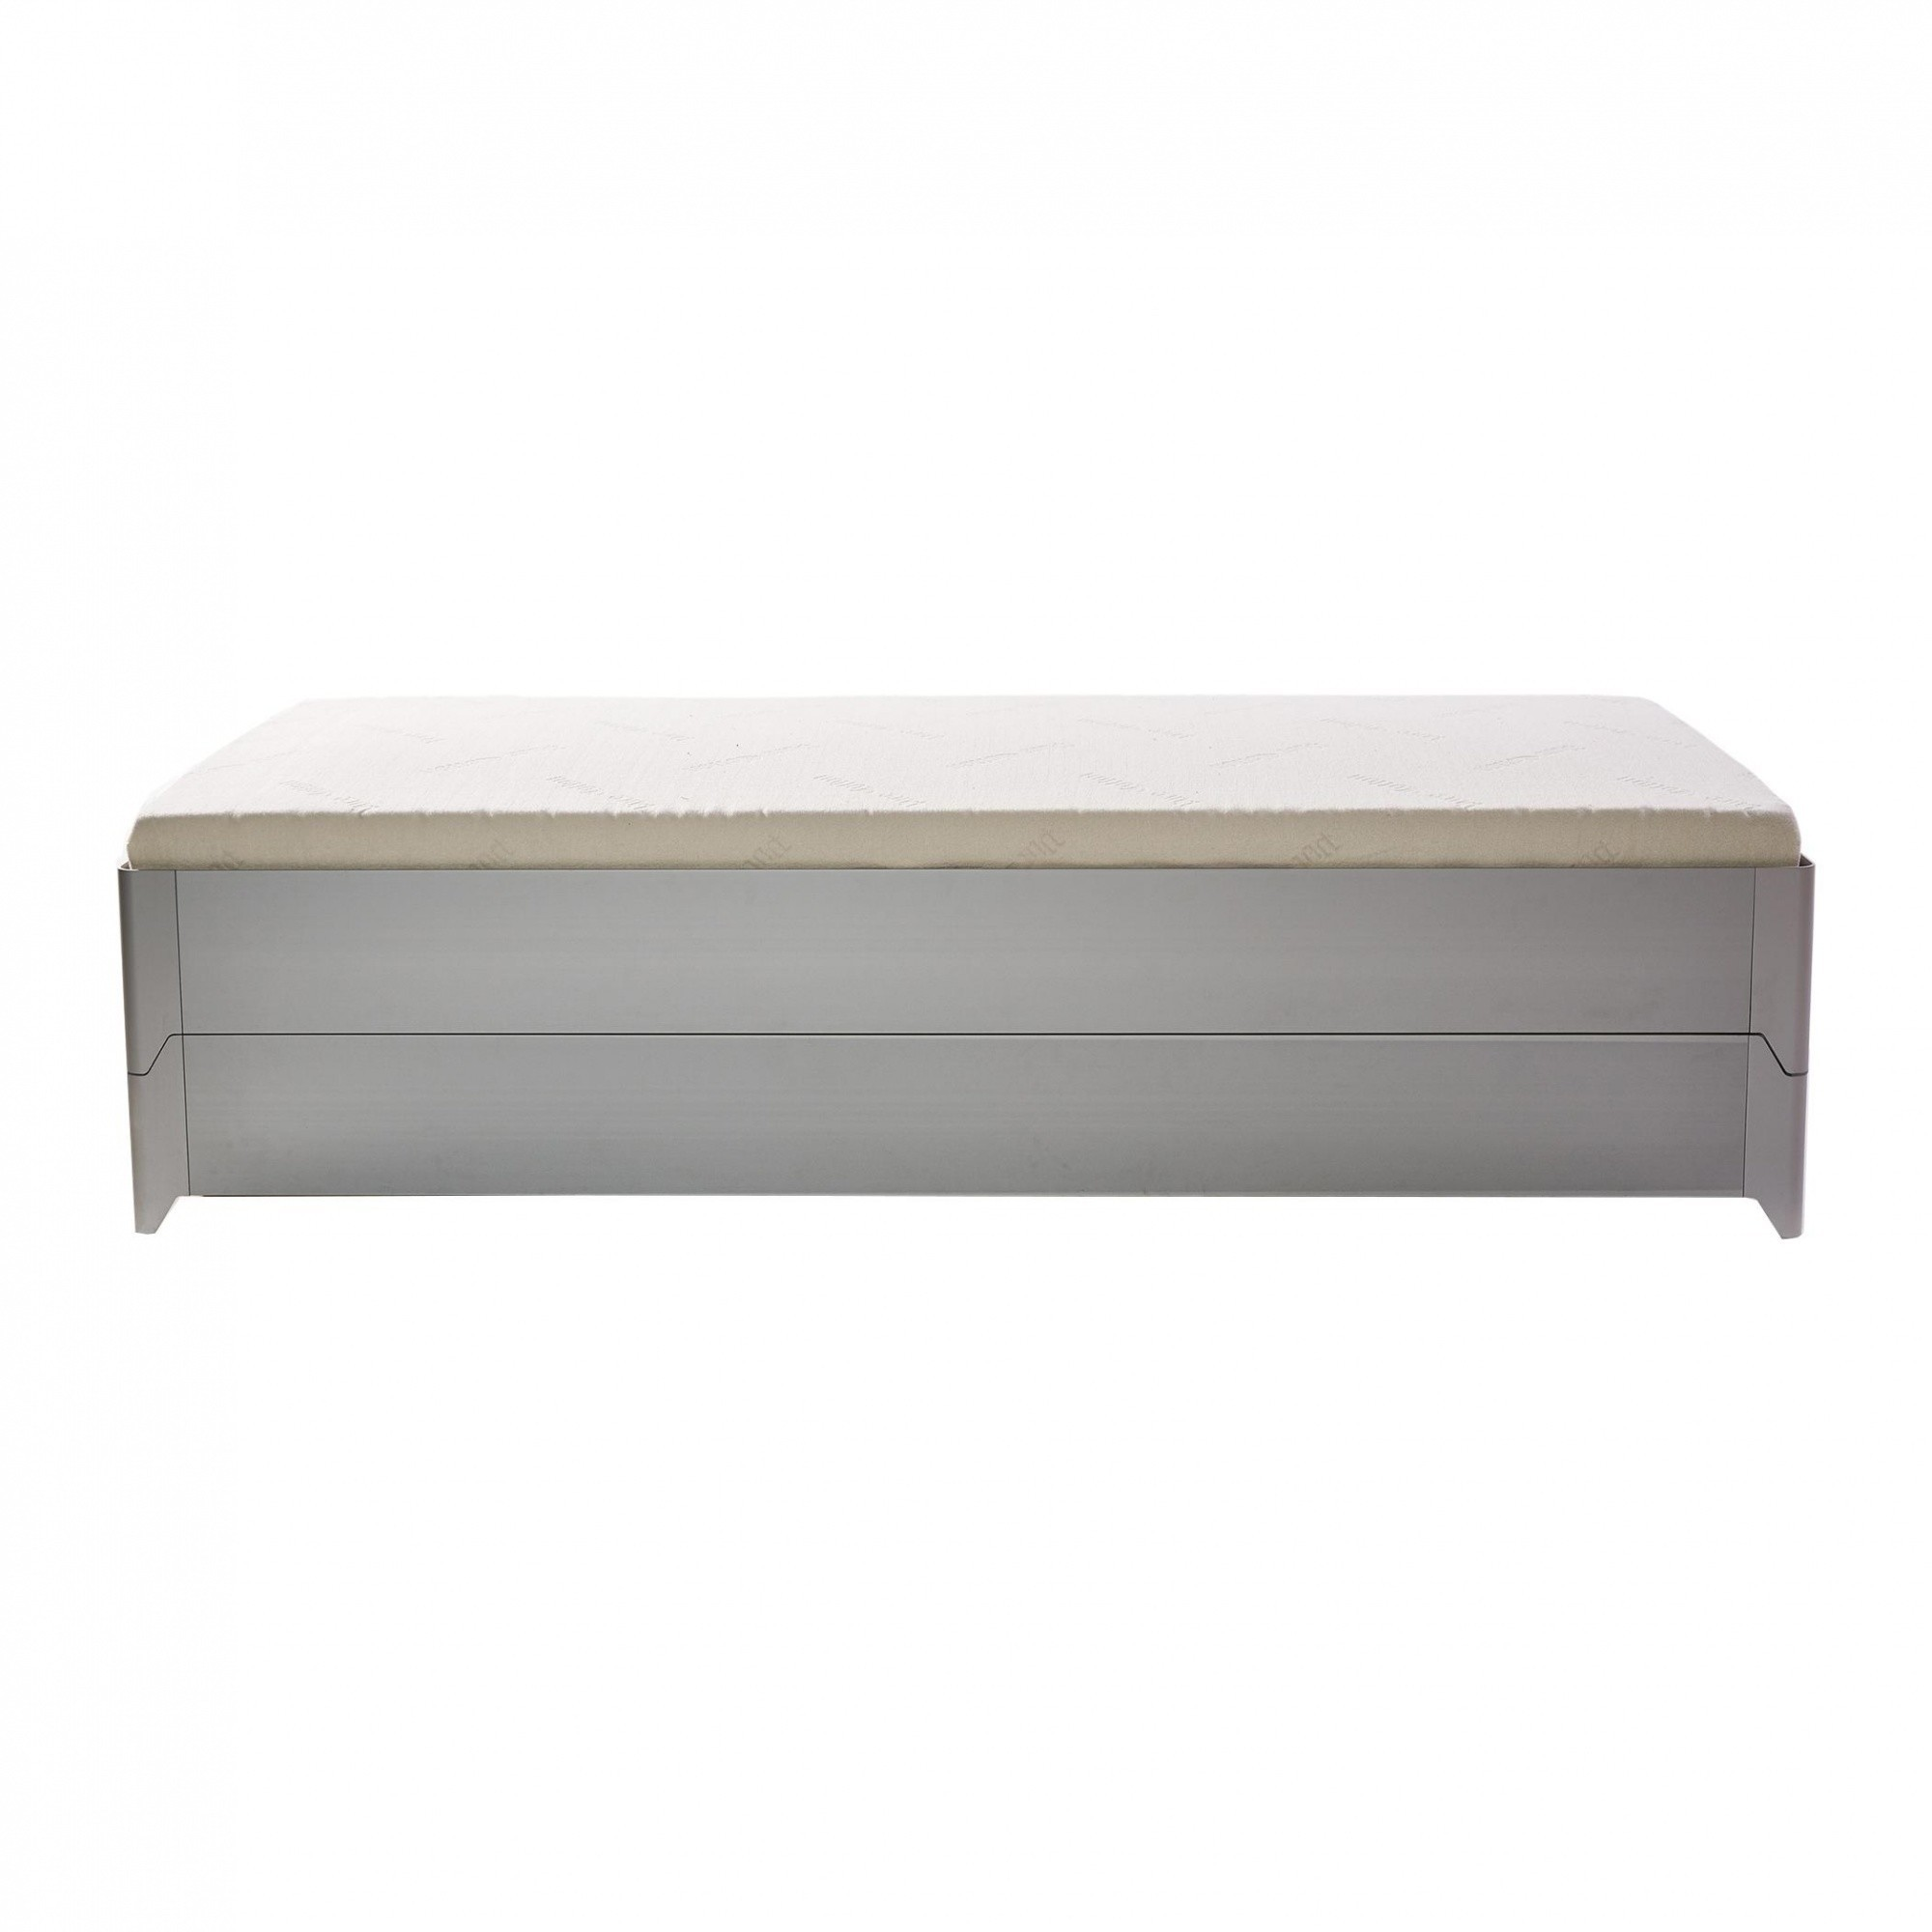 Toro Stacking Bed 90x200cm